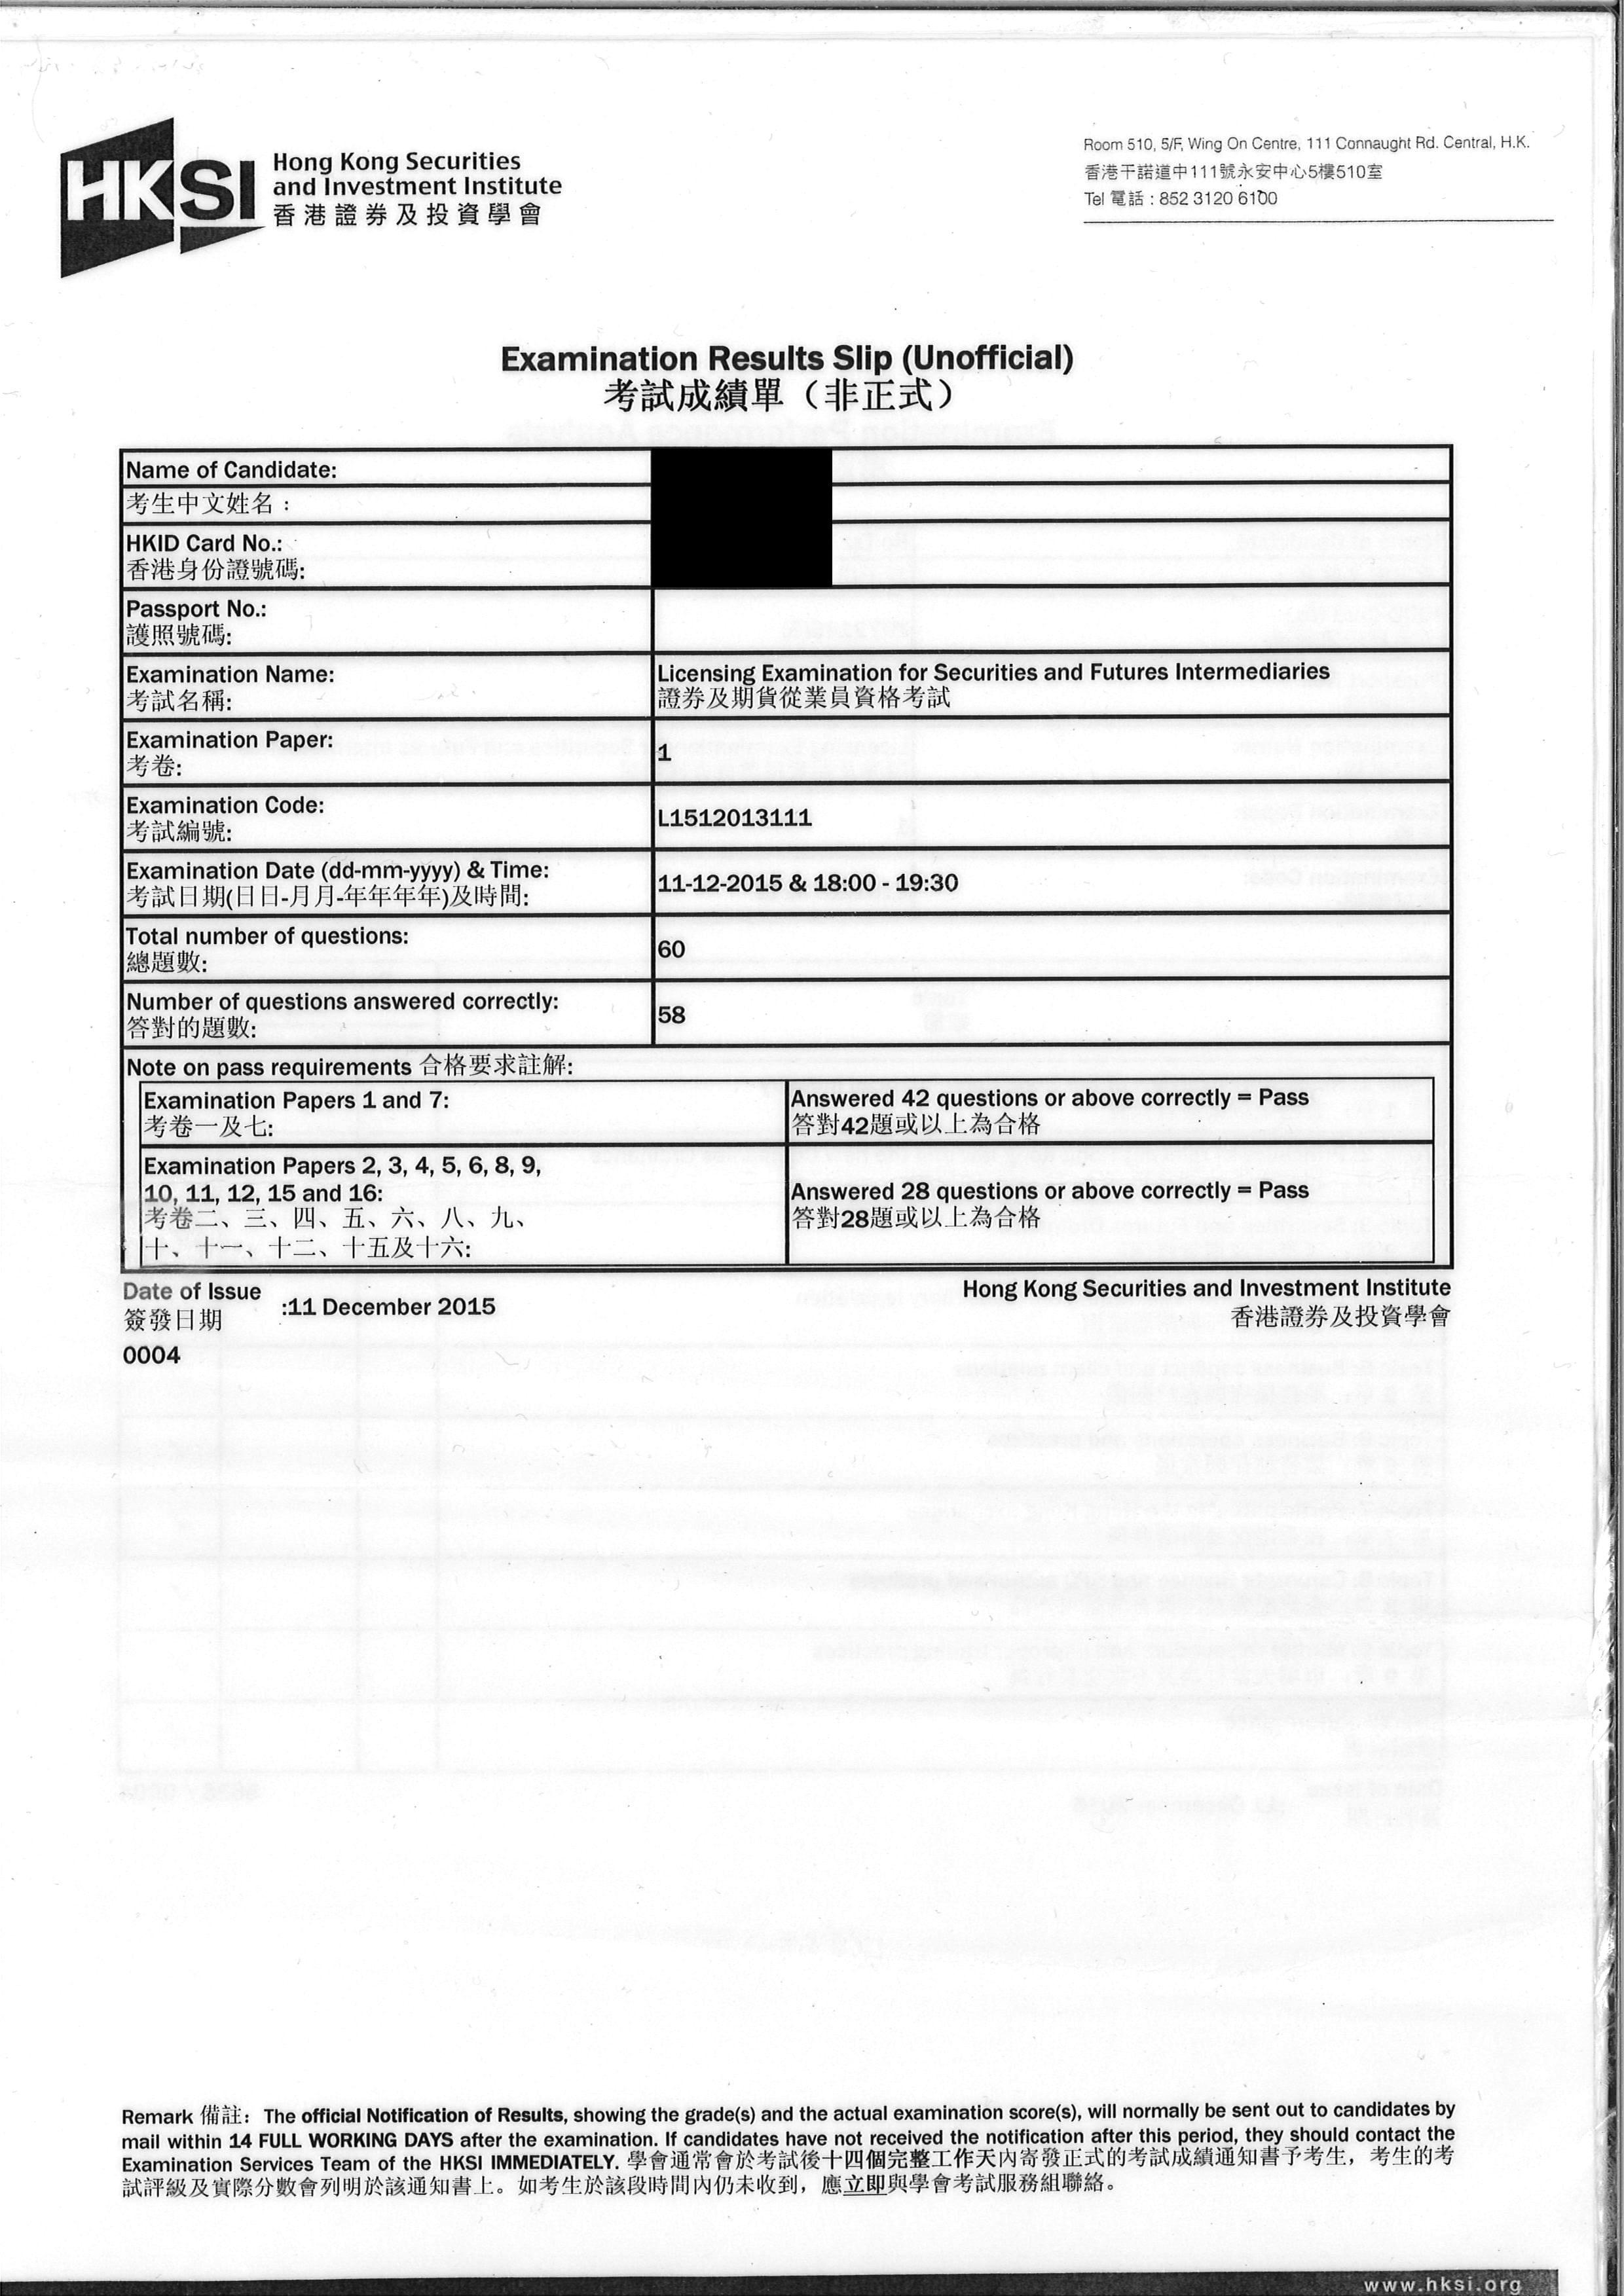 Conradko 11/12/2015 LE Paper 1 證券期貨從業員資格考試卷一 Pass